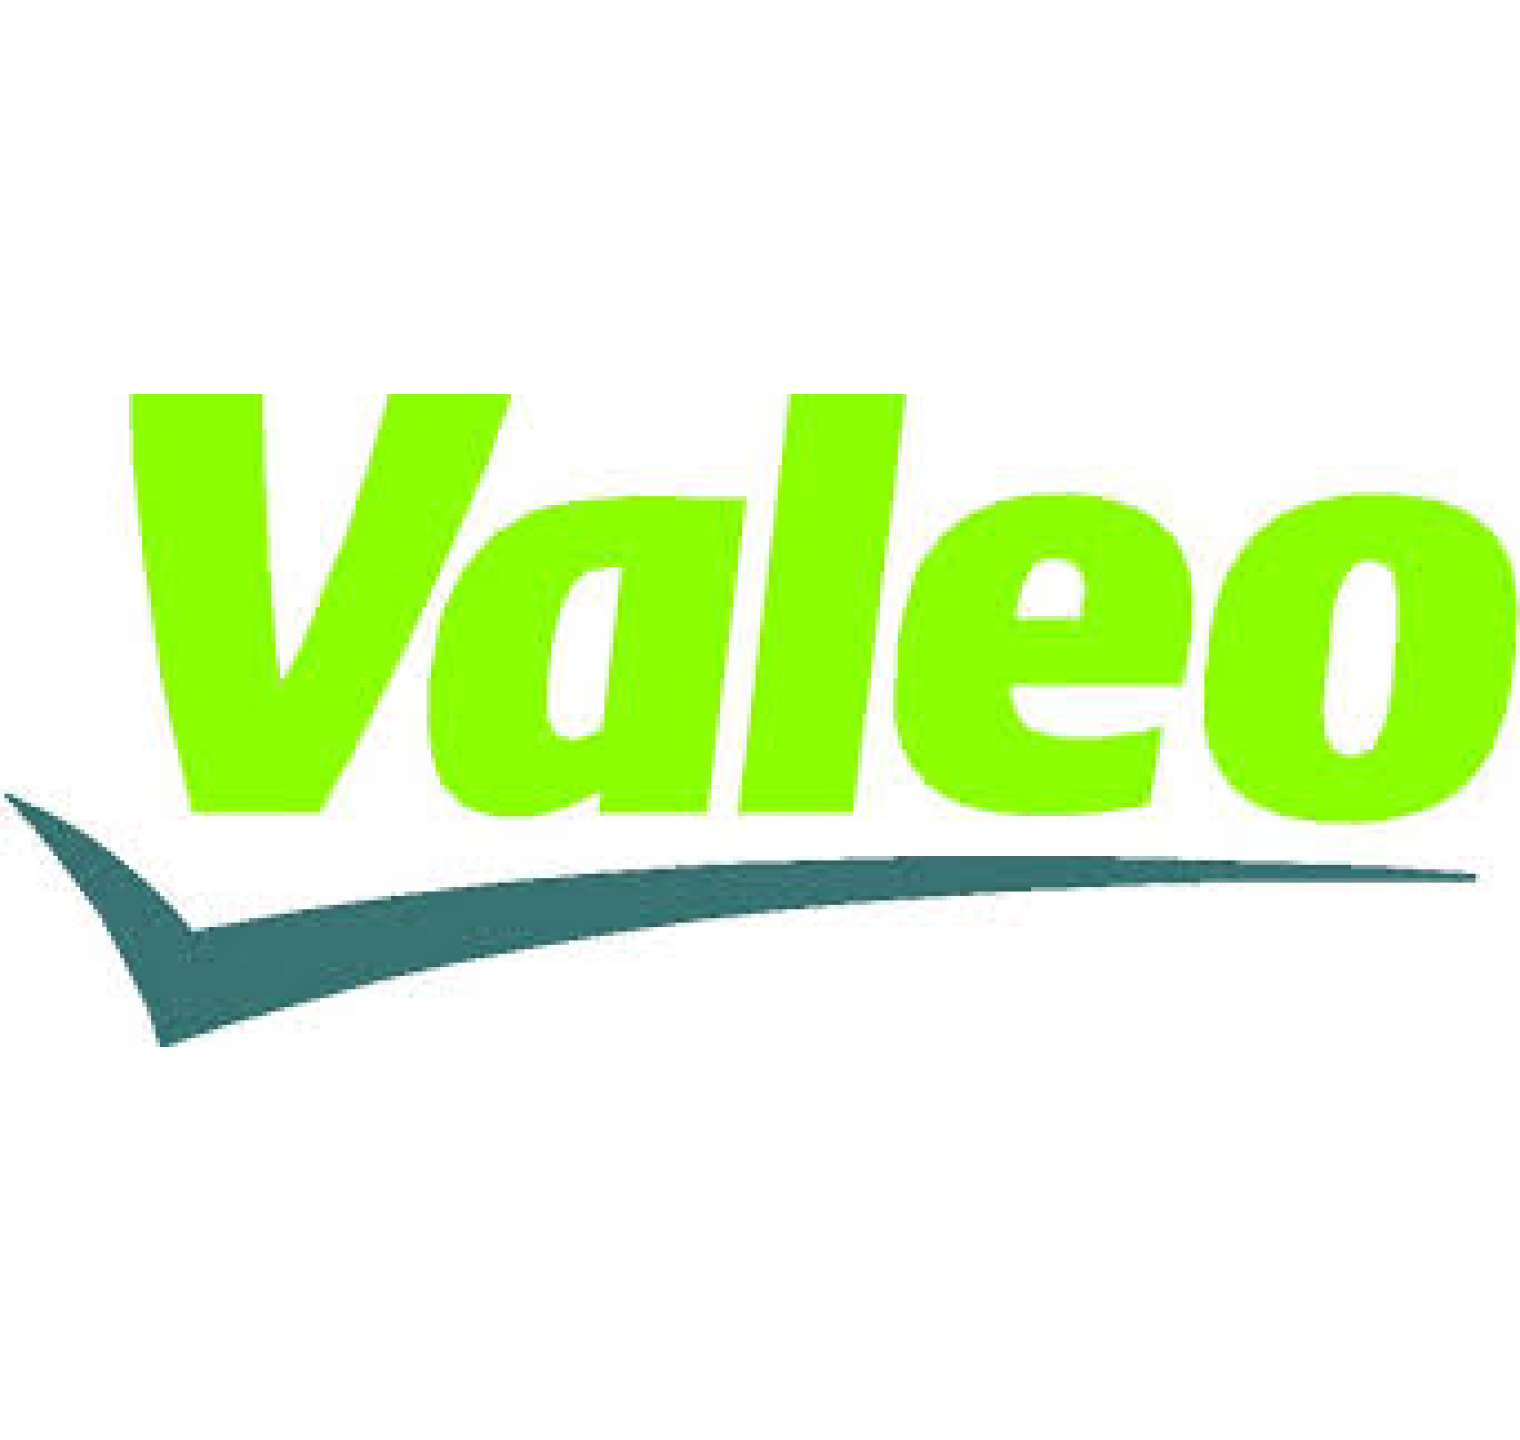 Valeo Parkeerhulp Systeem Kit 2